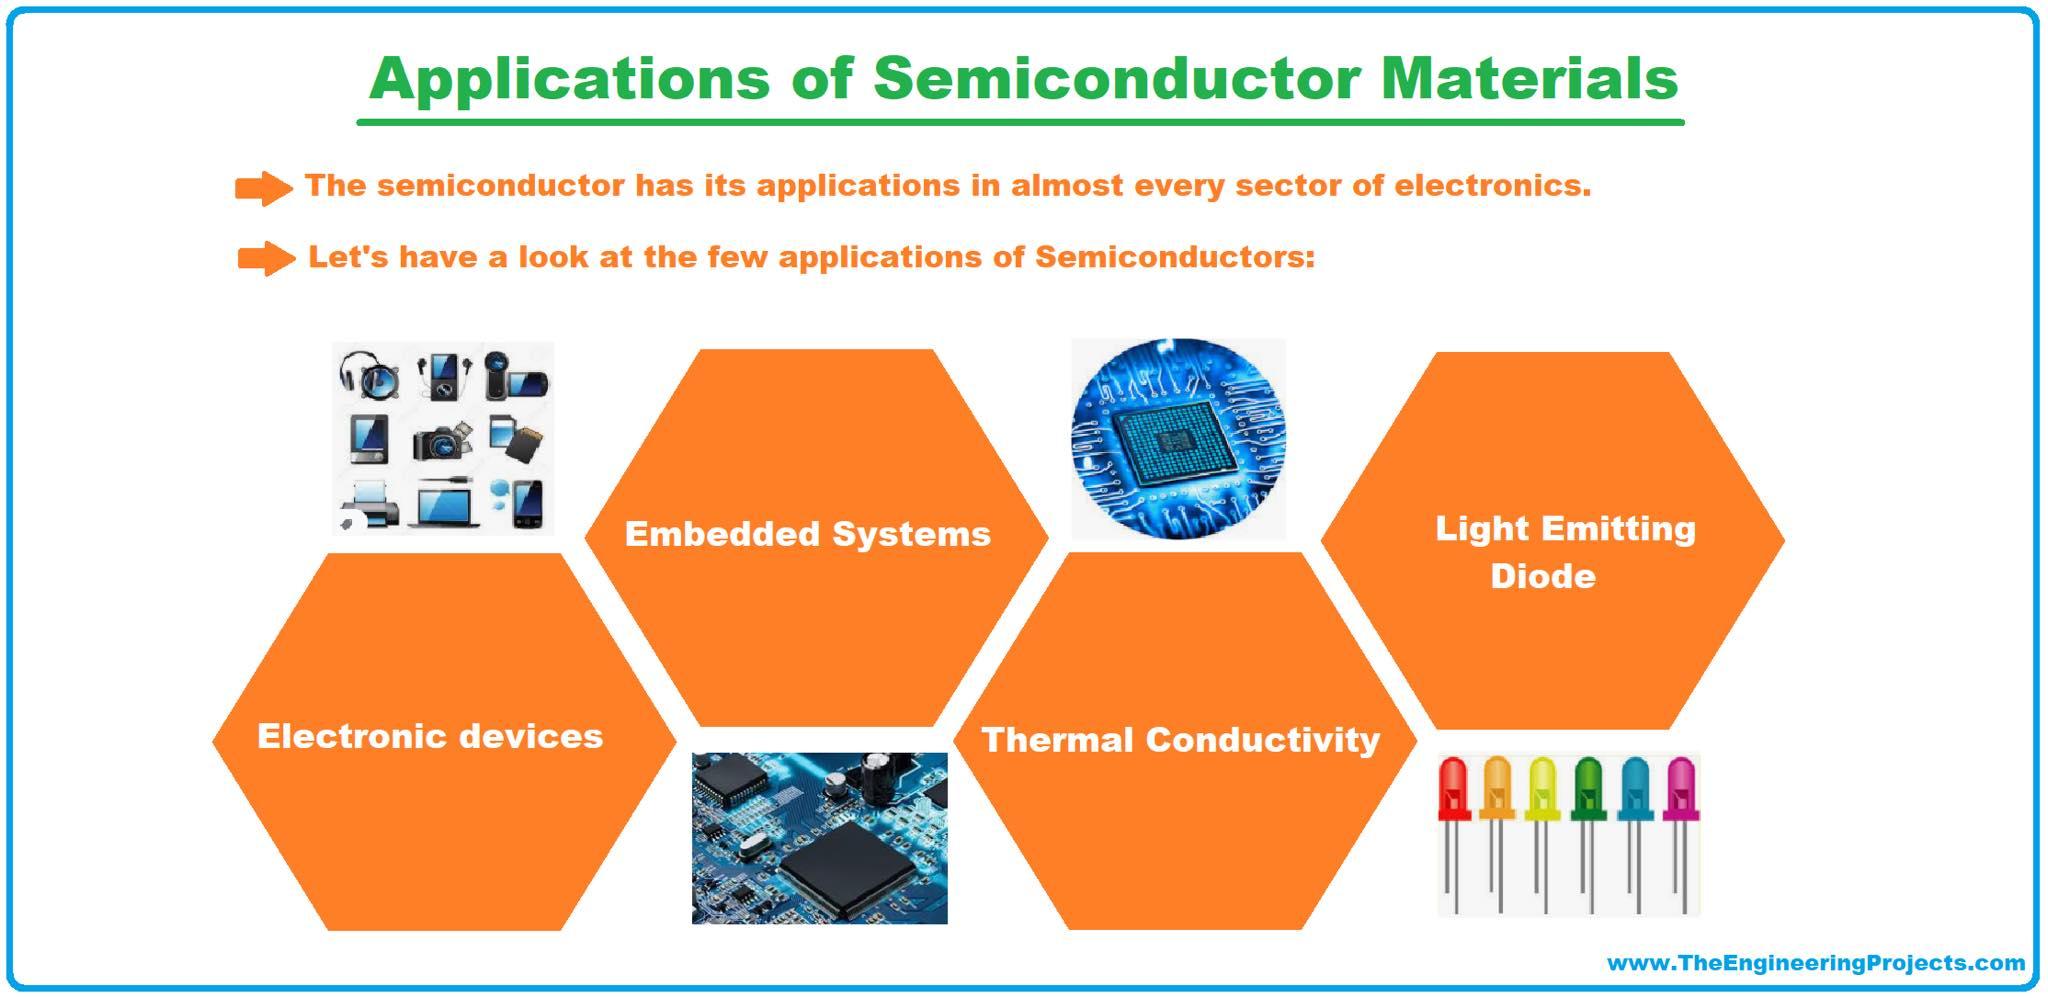 semiconductors, semiconductor, what is semiconductors, semiconductor applications, applications of semiconductors, semiconductor examples, semiconductor material, examples of semiconductor material